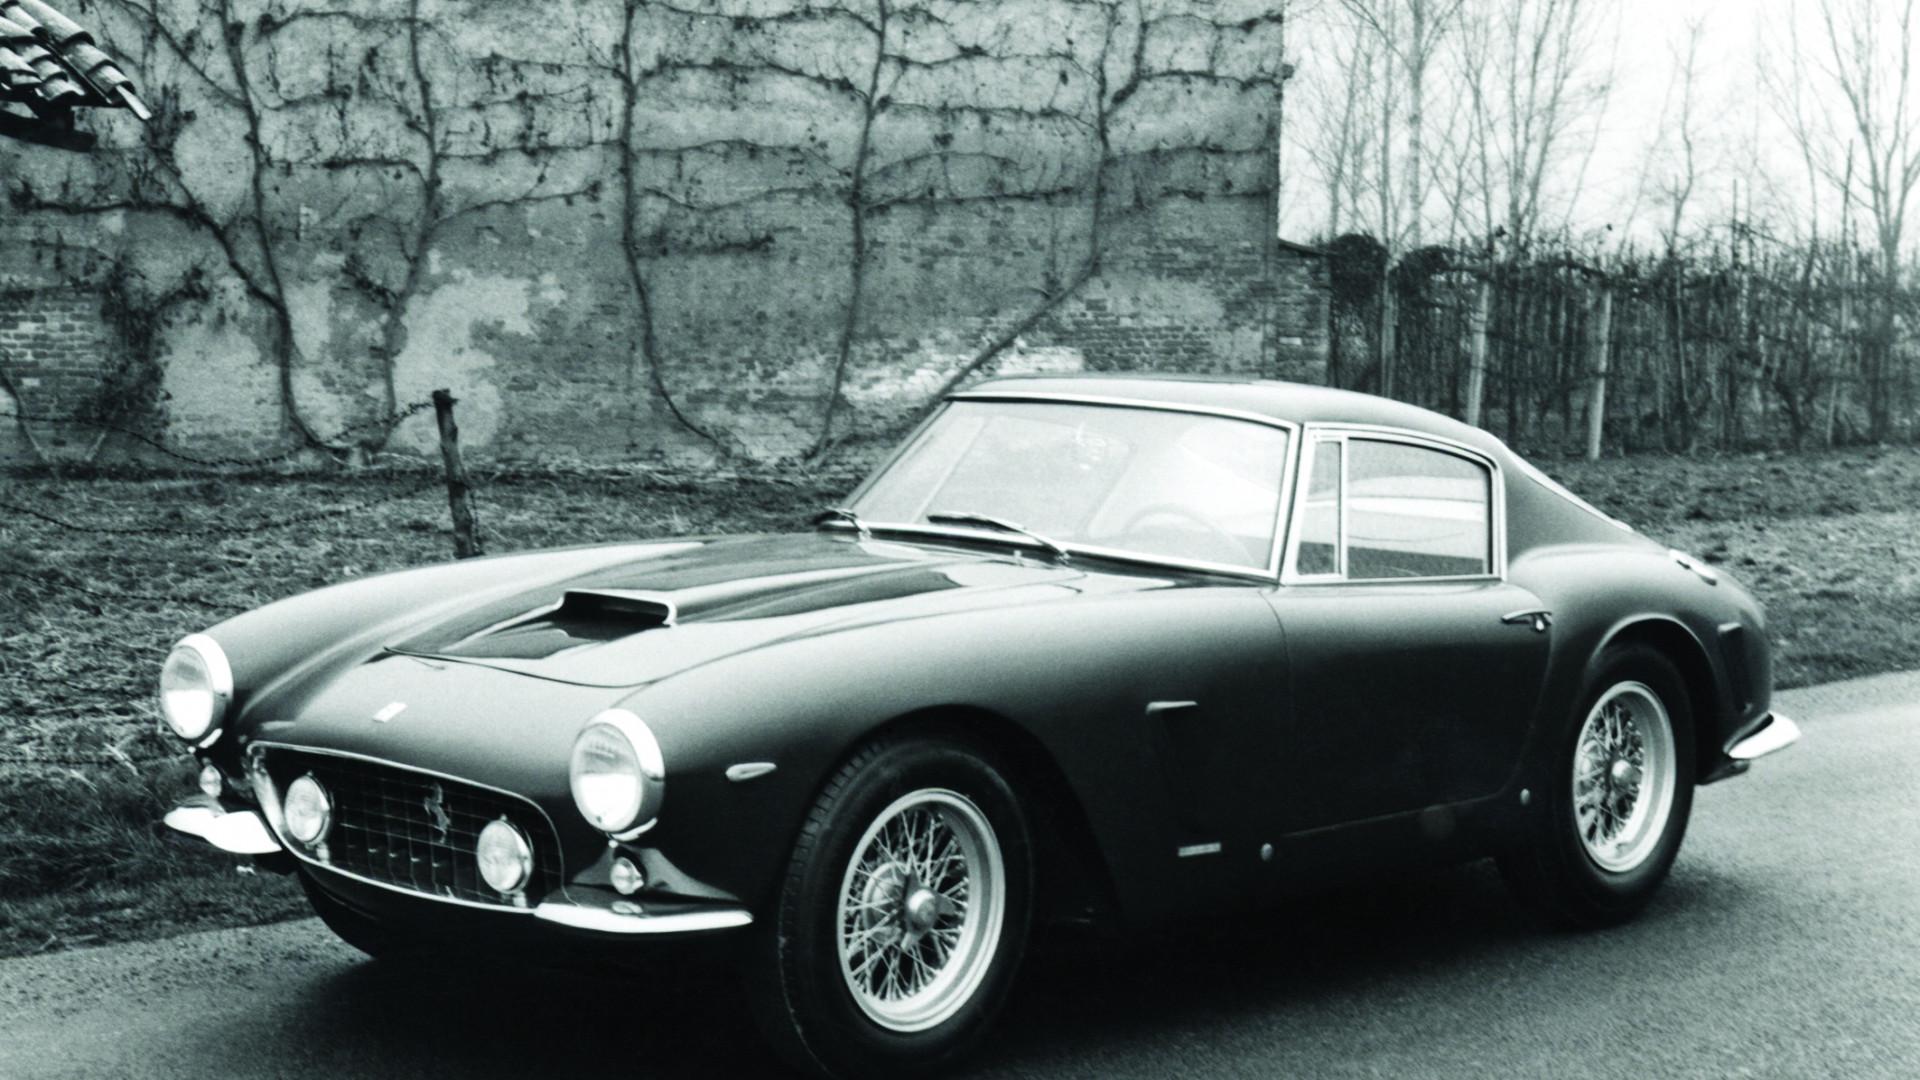 Ferrari 250 GT Berlinetta, 1959